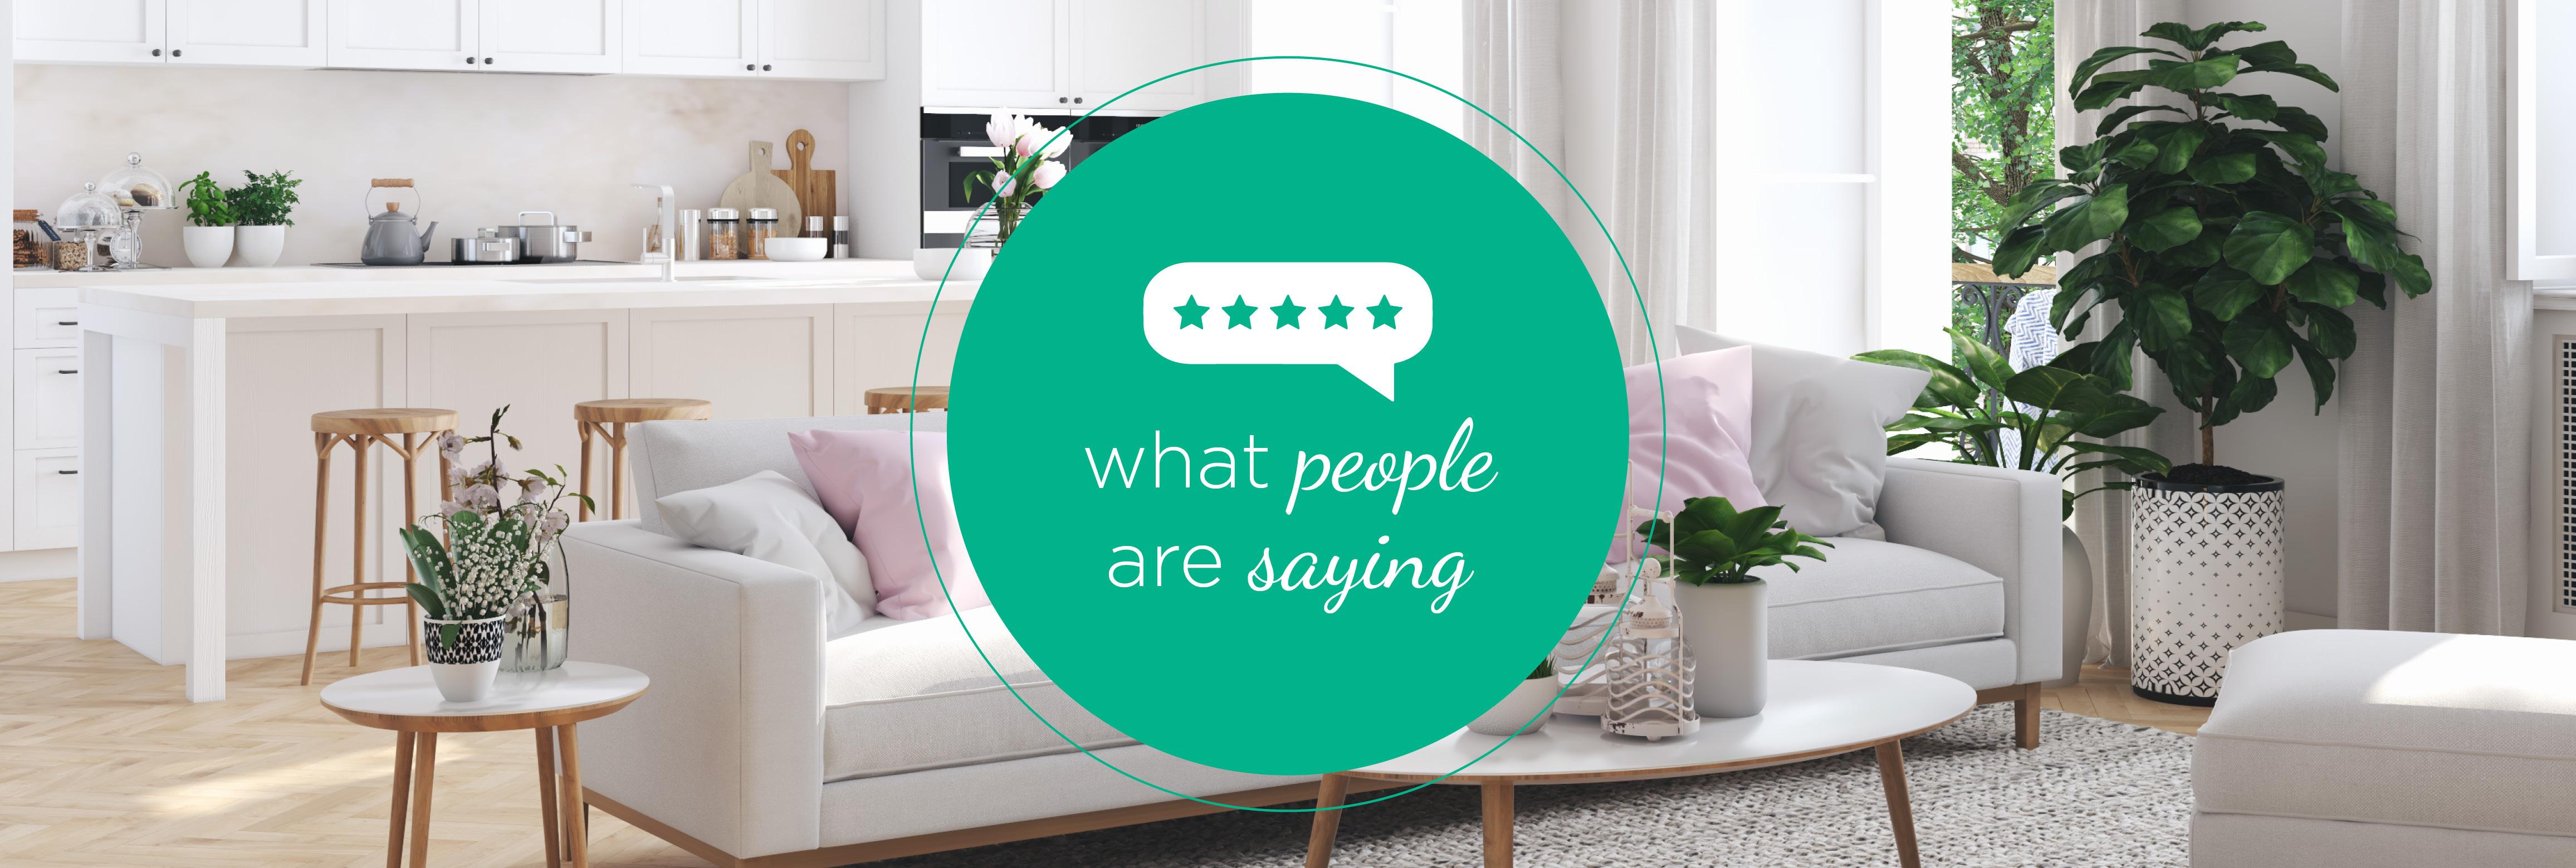 Waterstone Mortgage Corporation Reviews, Ratings | Mortgage Lenders near 2830 Ramada Way , Green Bay WI